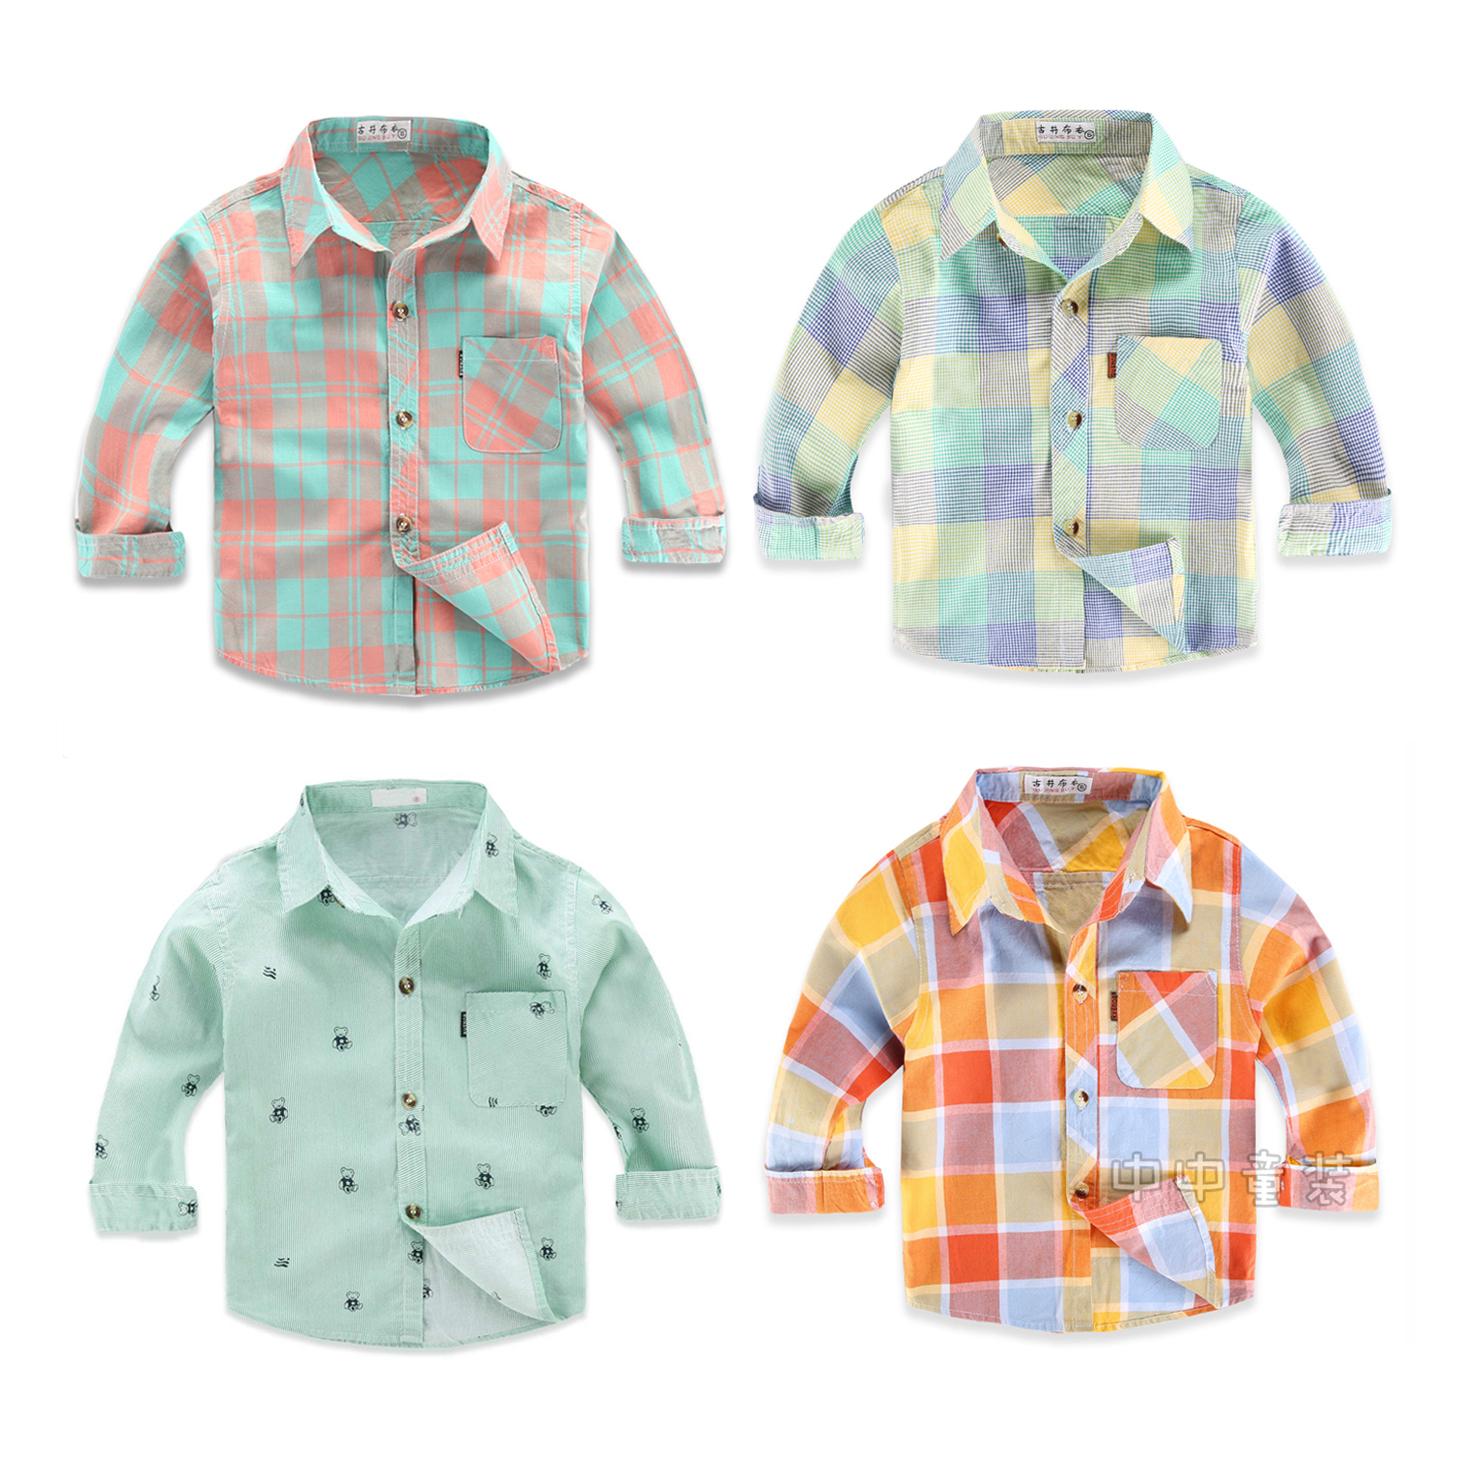 Kids Boys Top Long Sleeve Shirt Cotton Jacket Baby Plaid Shirt Kids Clothing Tops